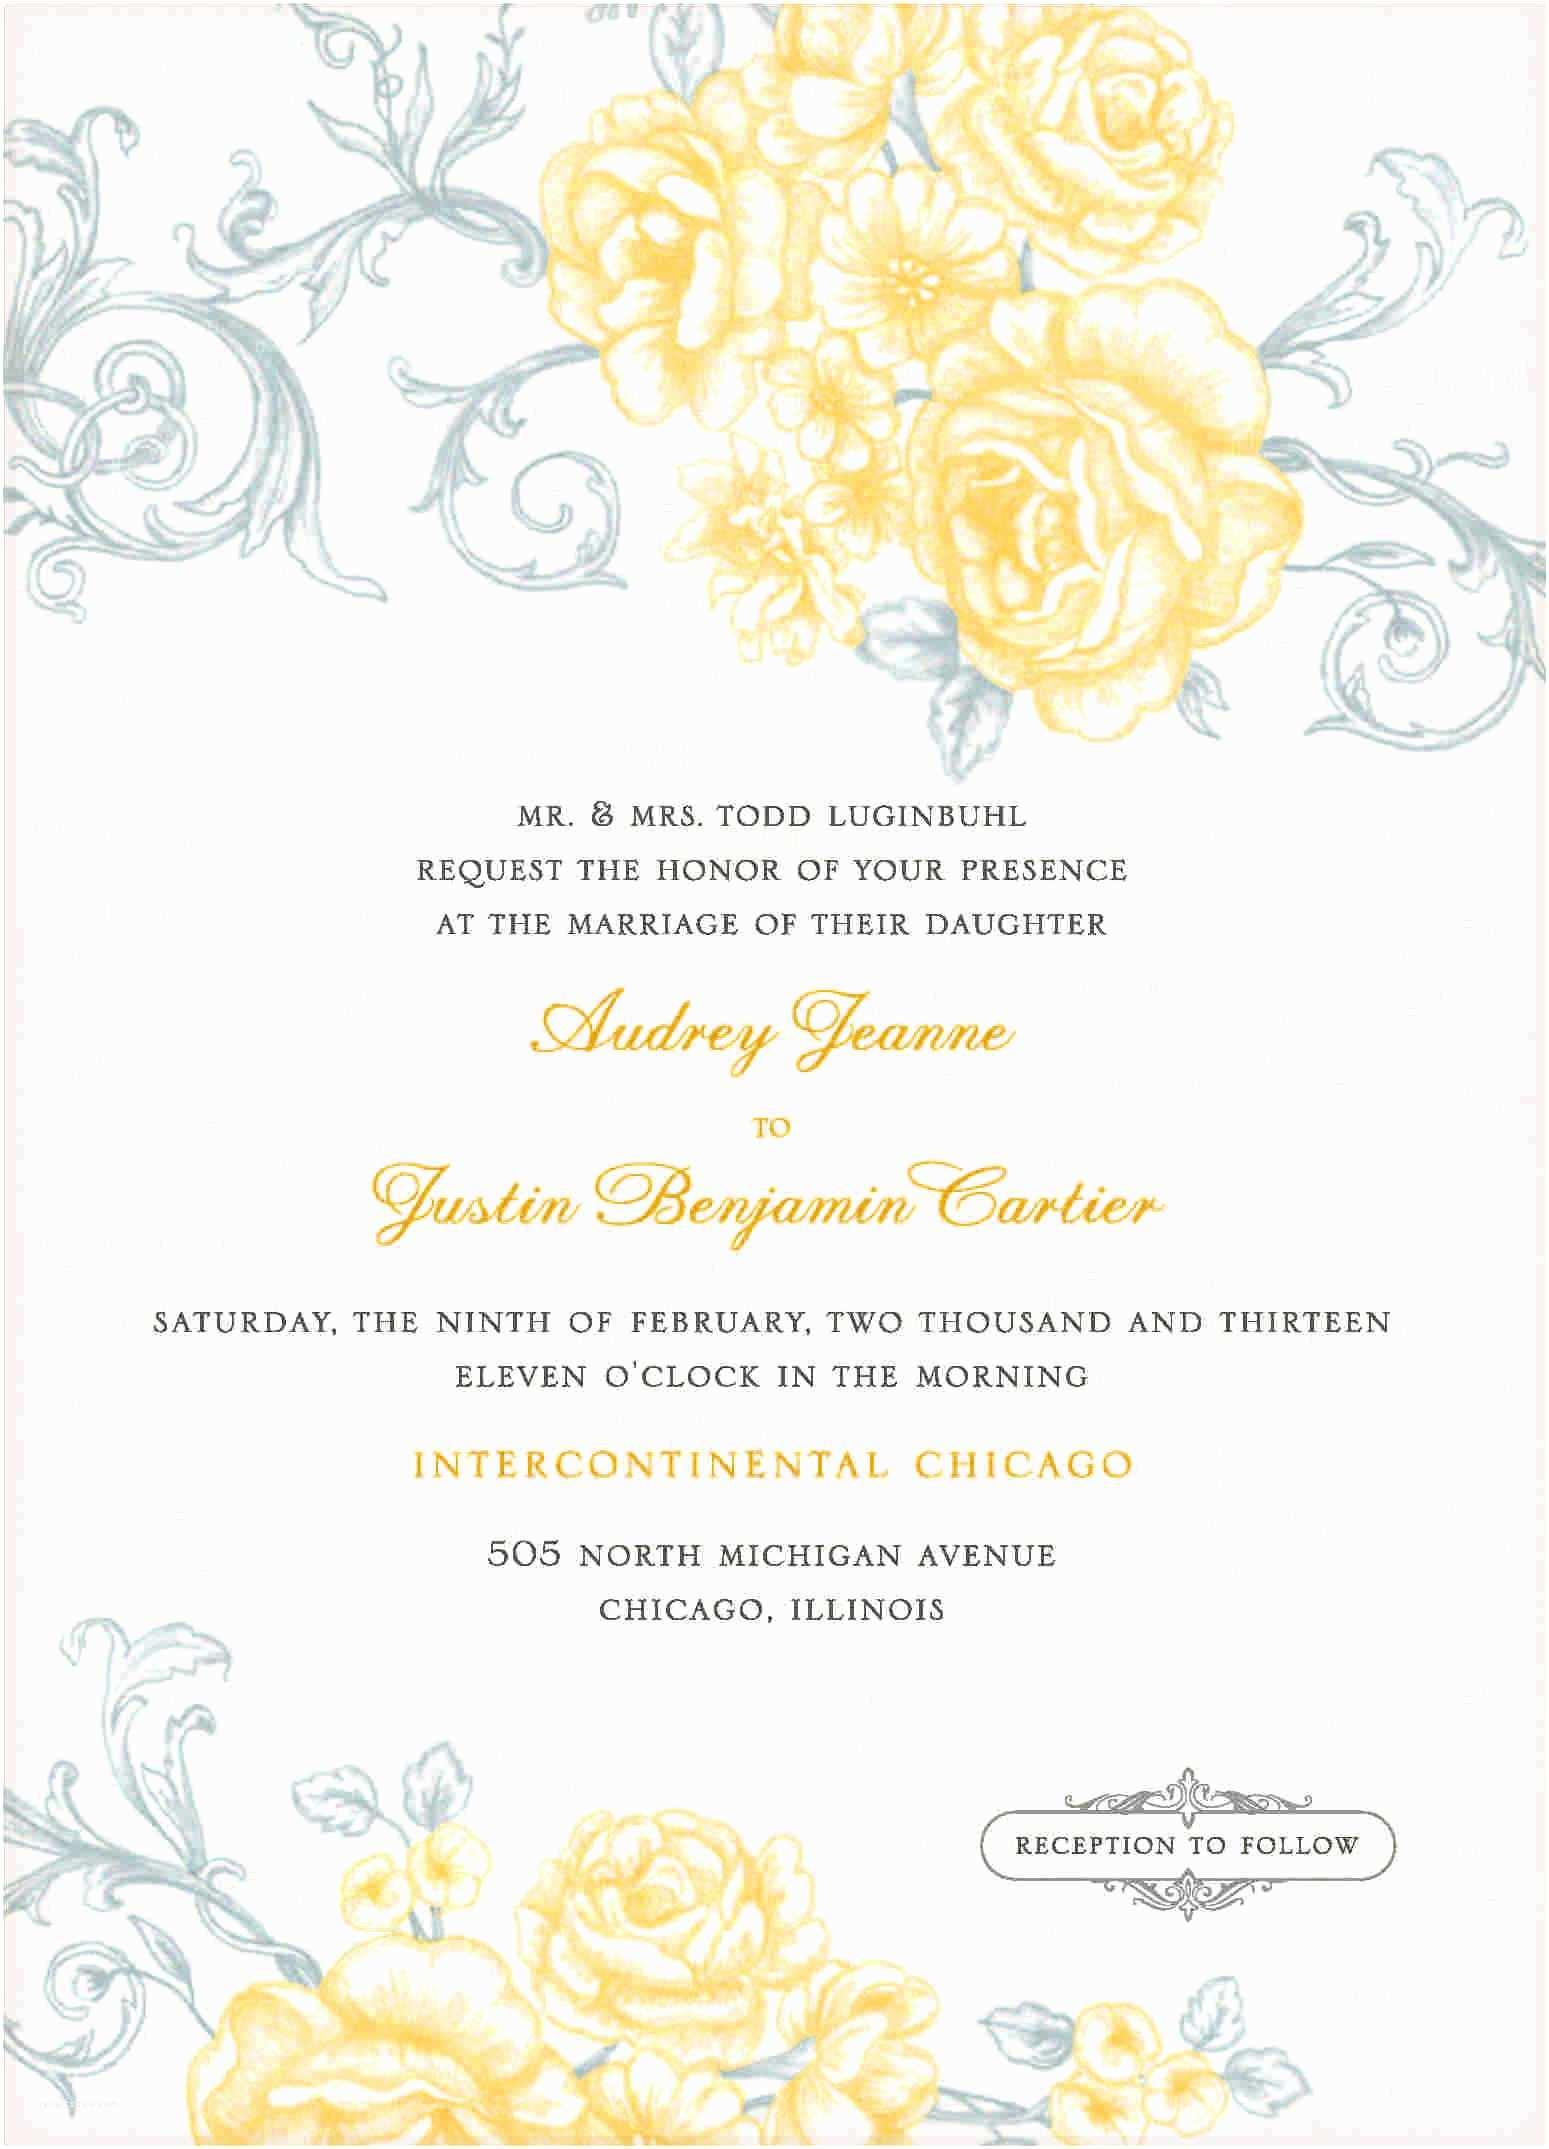 Free Online Wedding Invitation Templates 9 Free Wedding Invitation Template